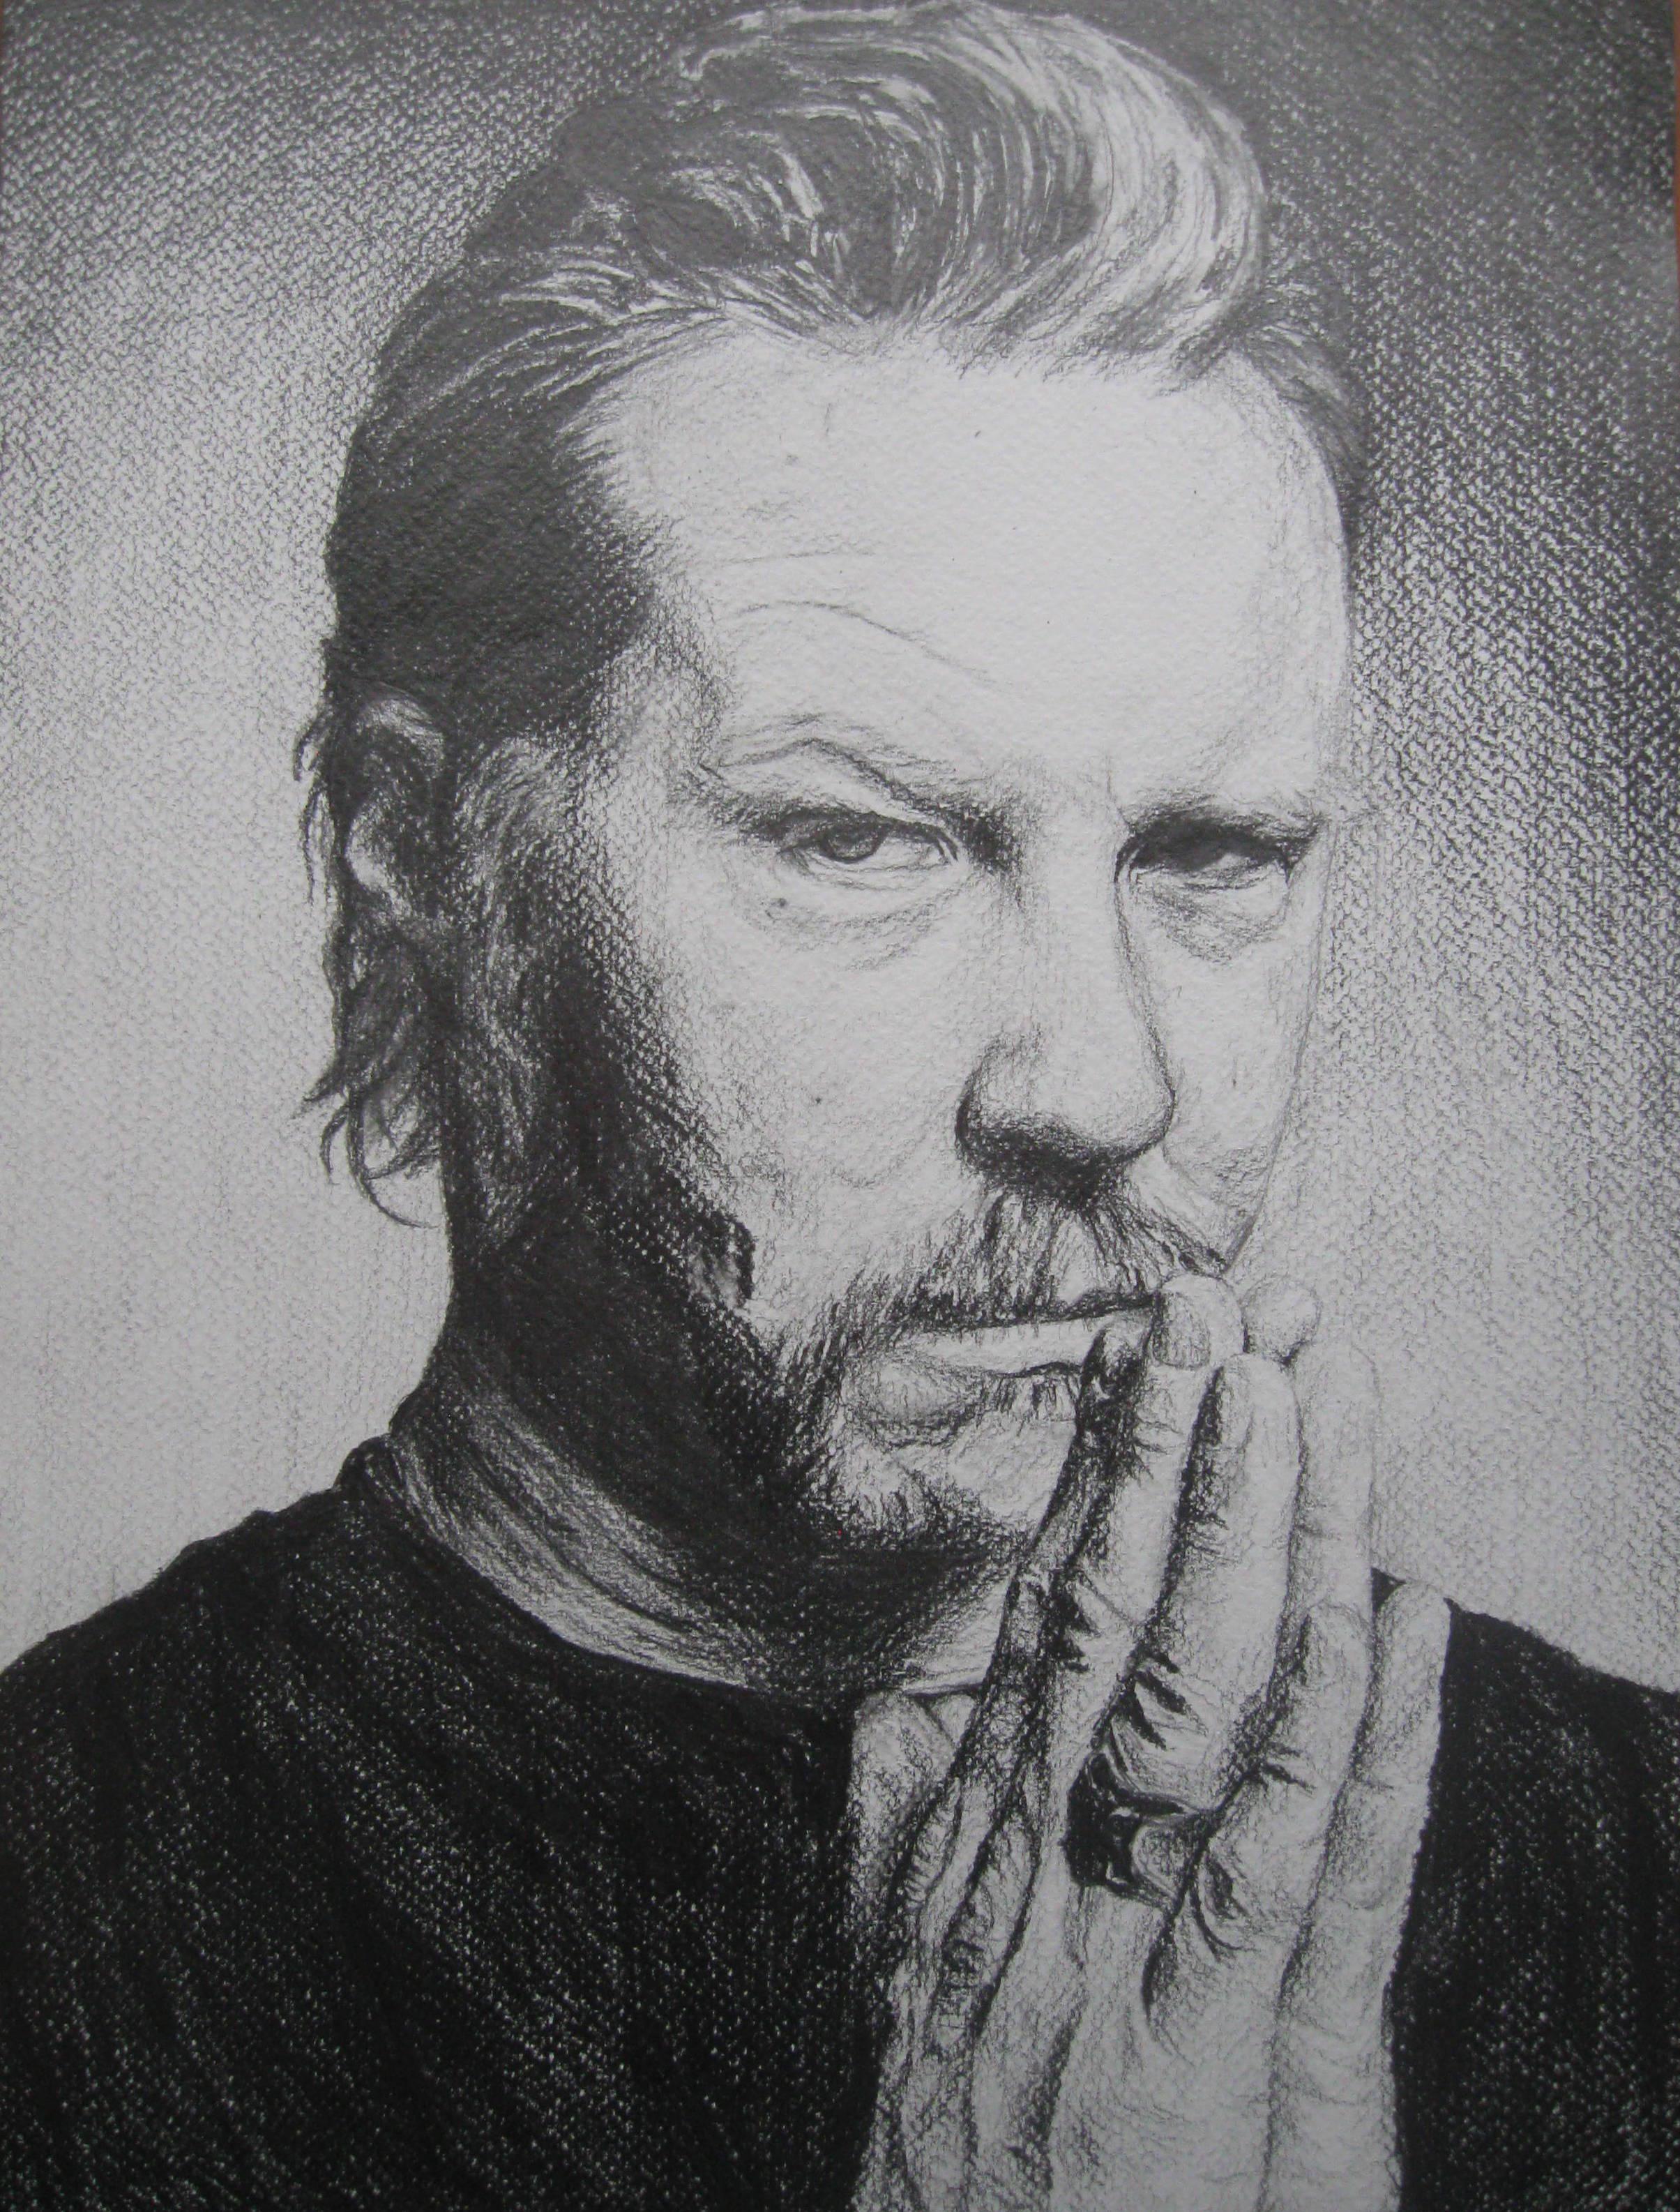 James Hetfield Portrait by Szetyi